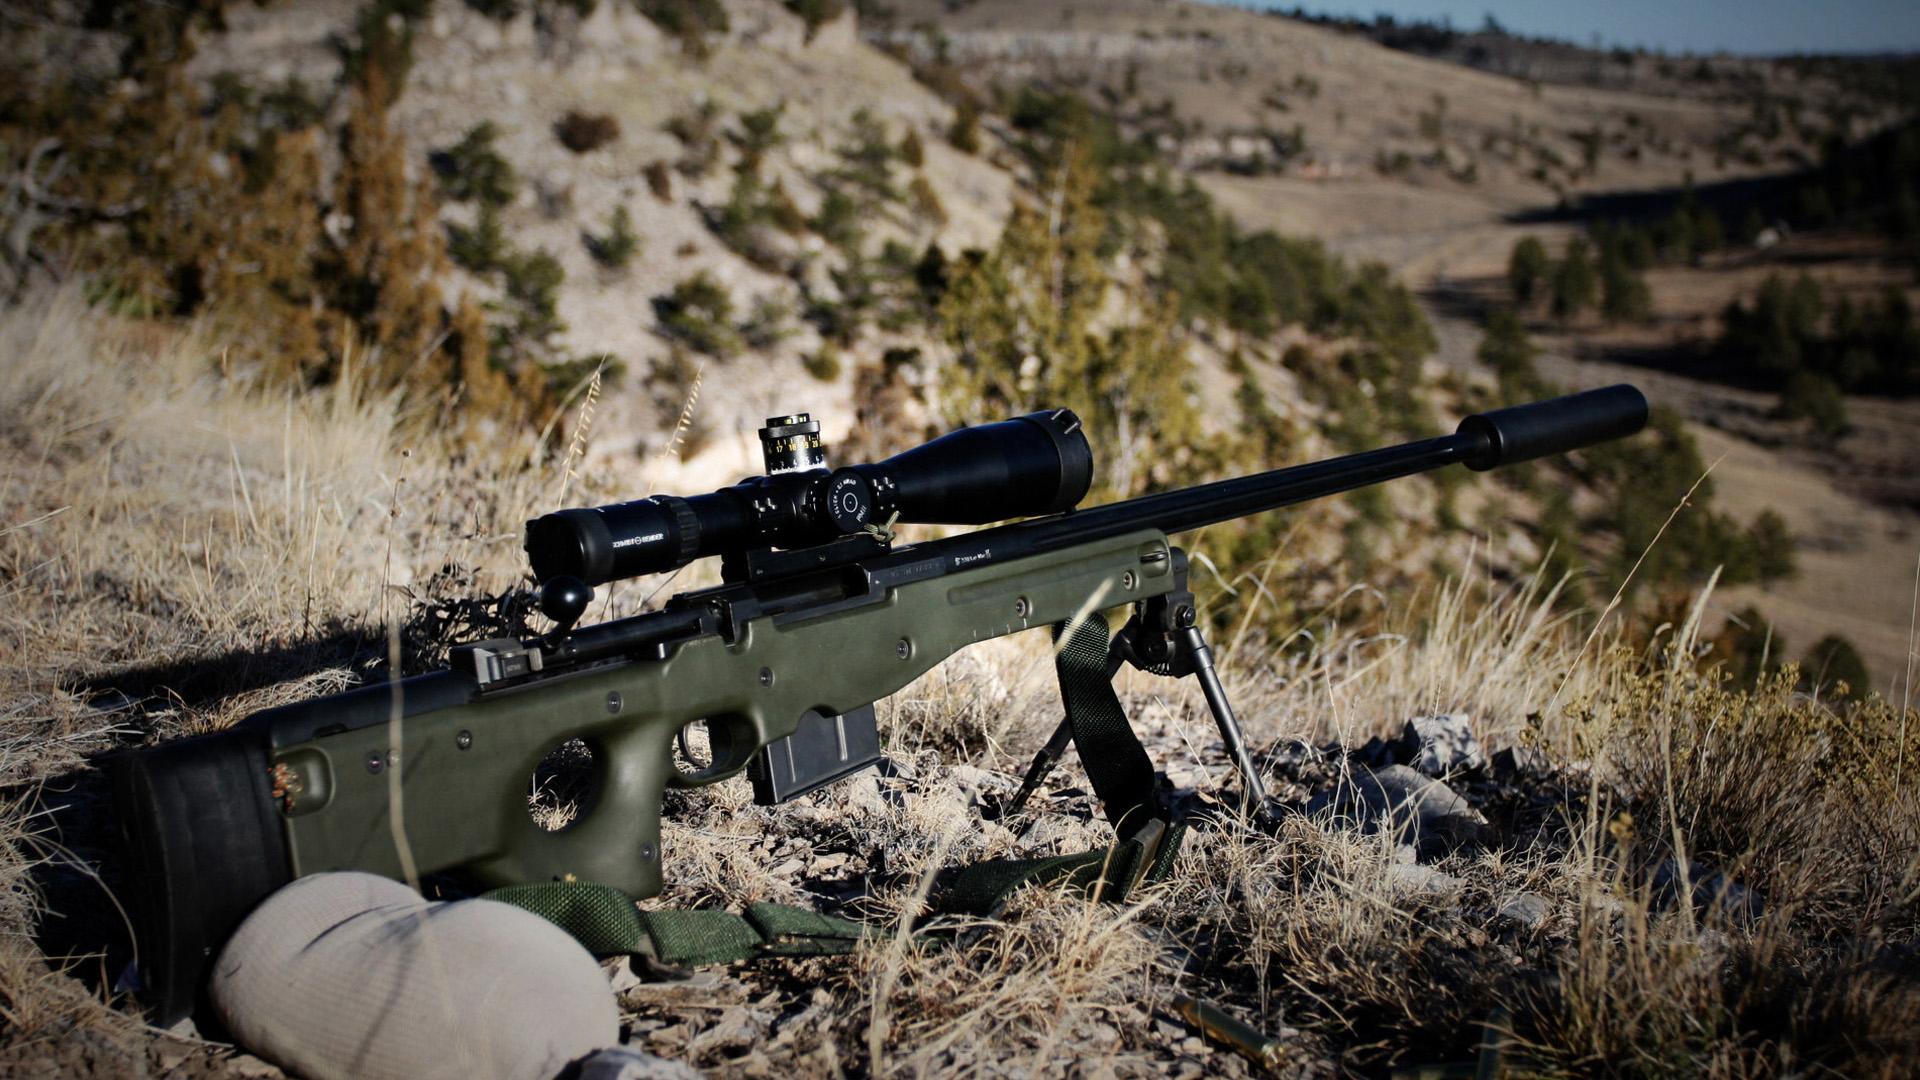 American Sniper Wallpaper HD 1920x1080